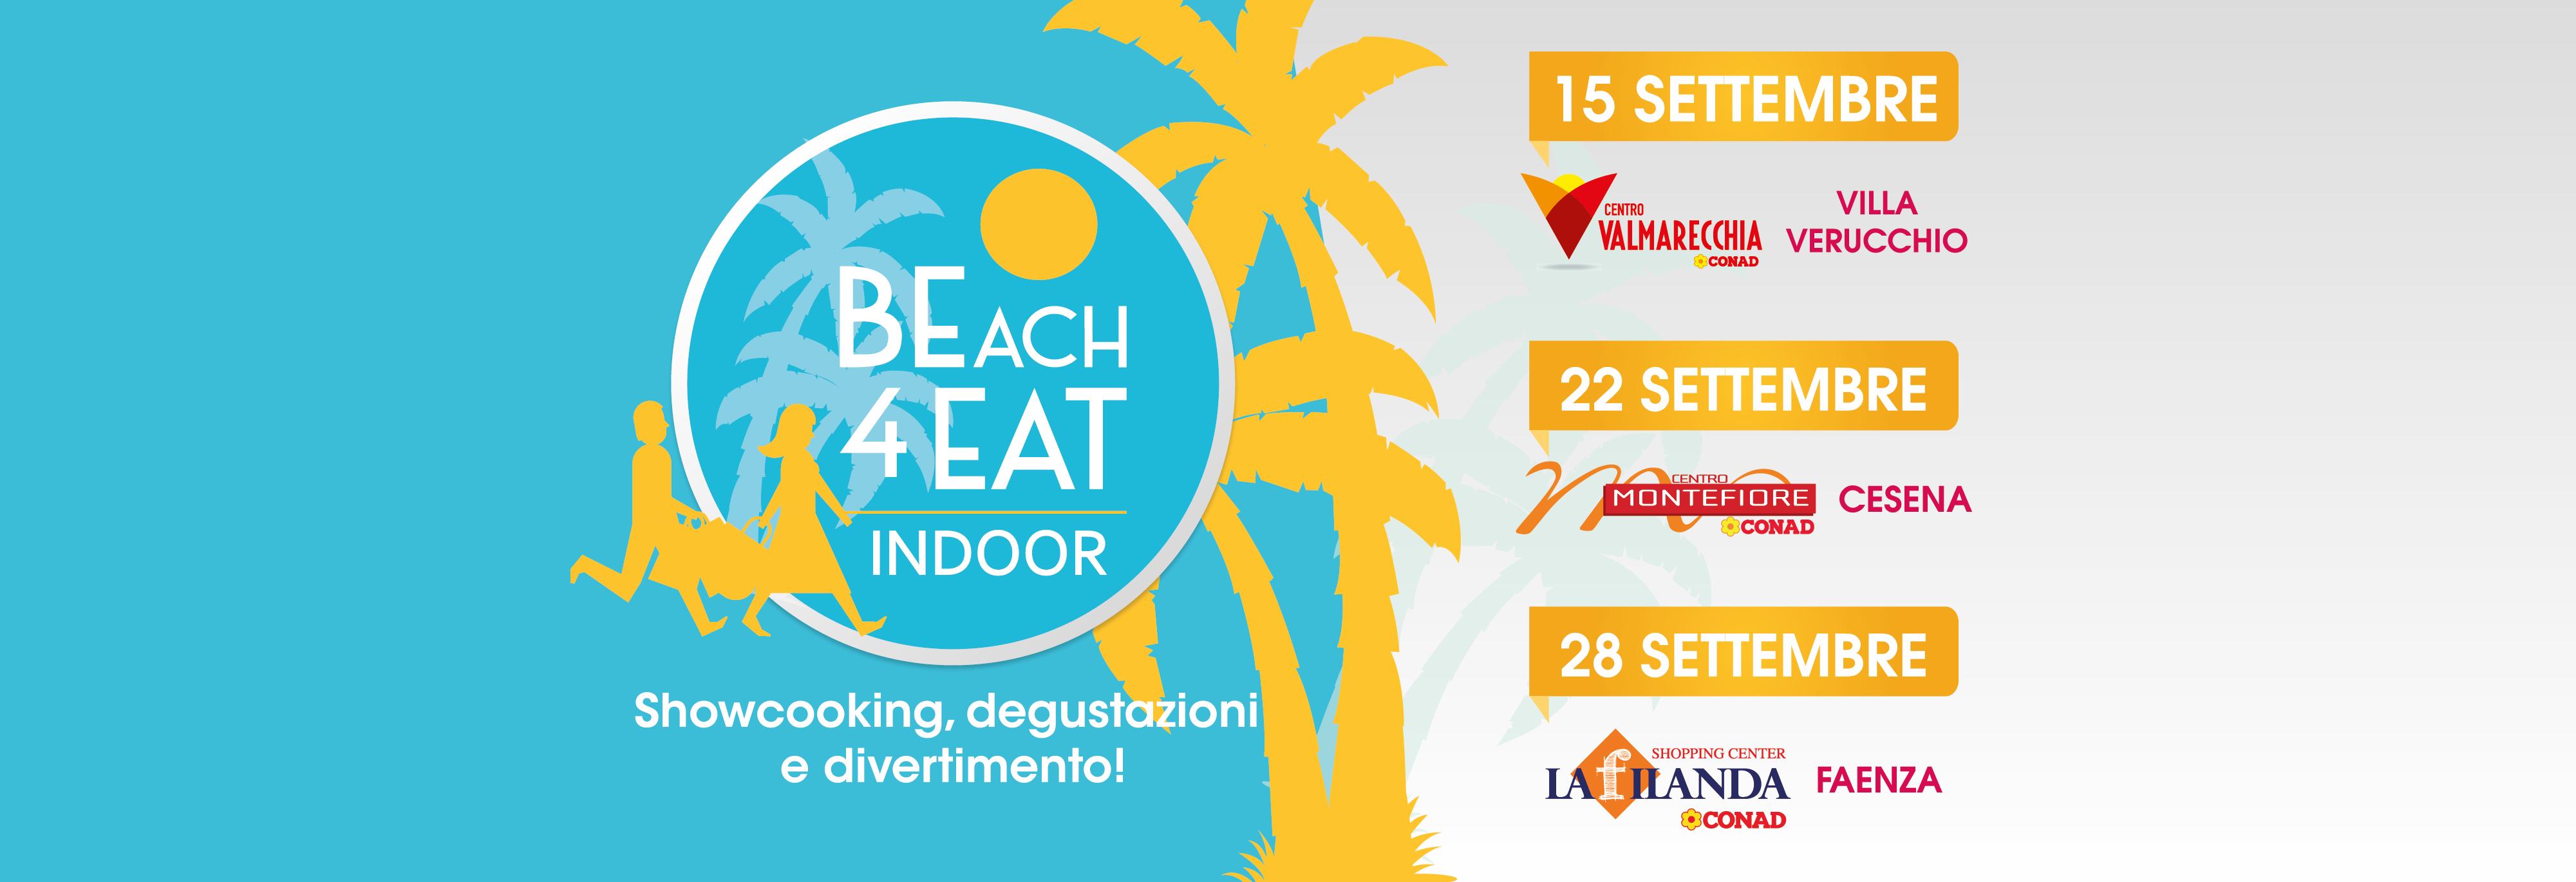 beach4eat_fb_sito_valm_fil